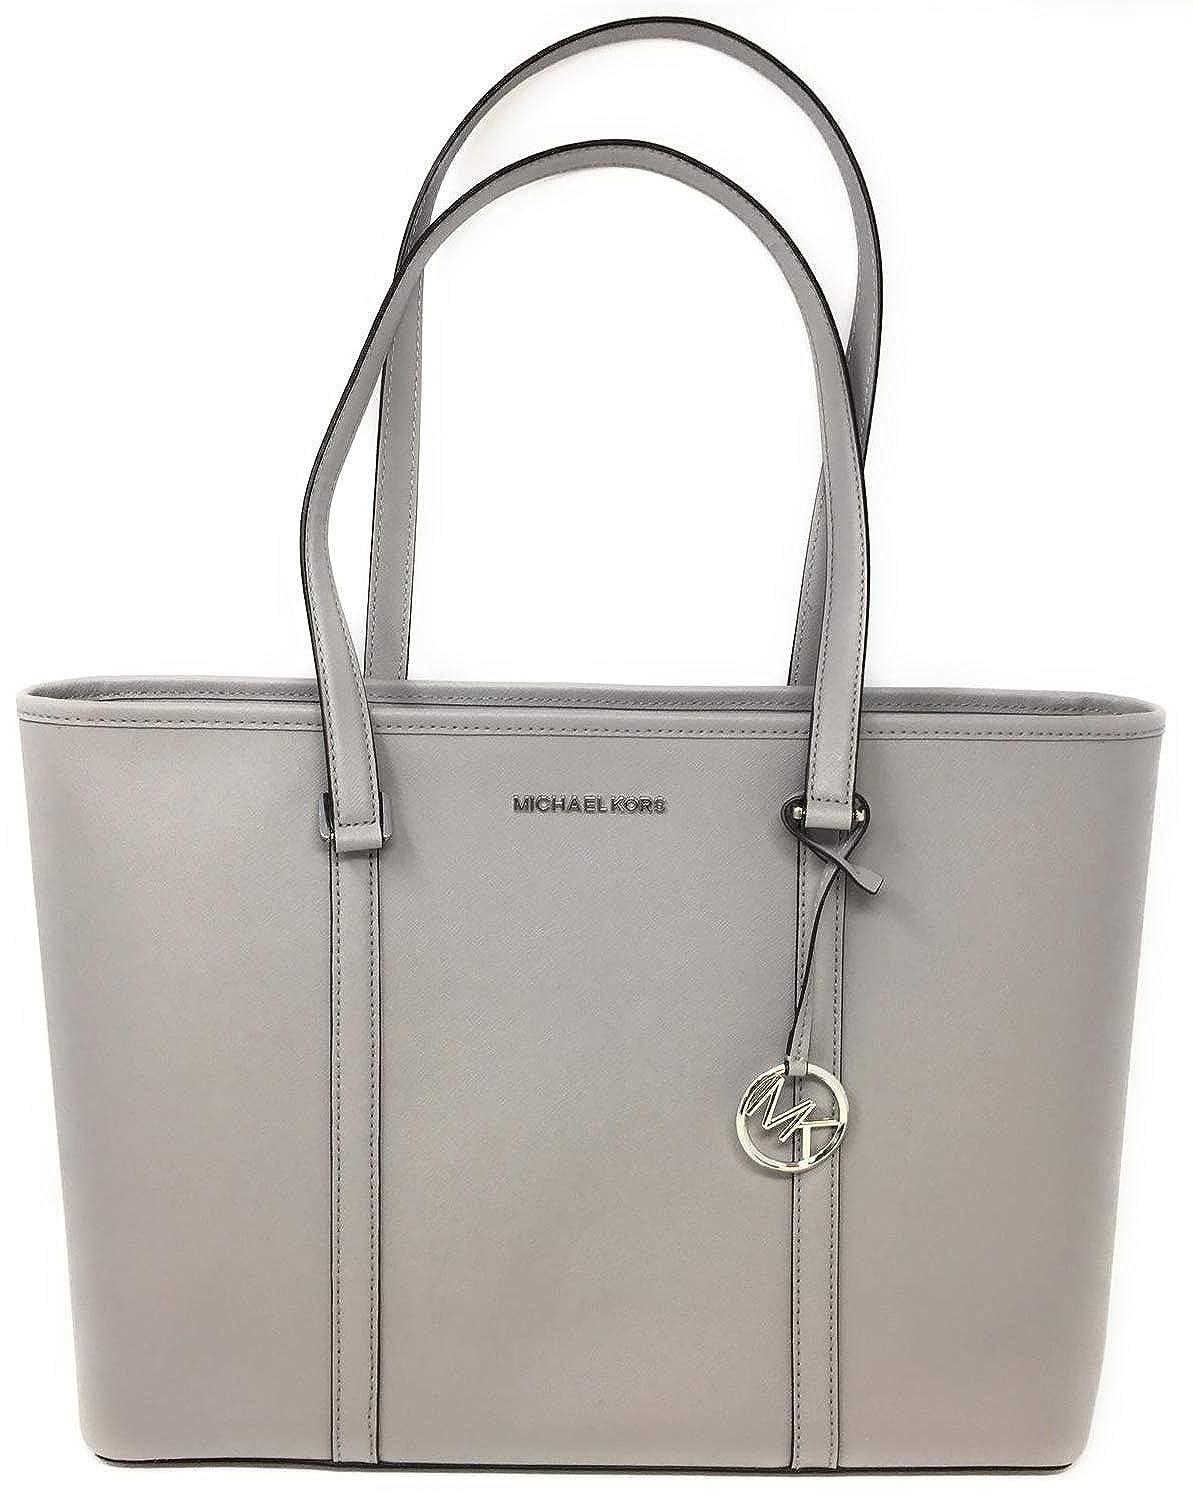 52022592246a Michael Kors Large Leather Sady Tote Purse: Amazon.ca: Shoes & Handbags